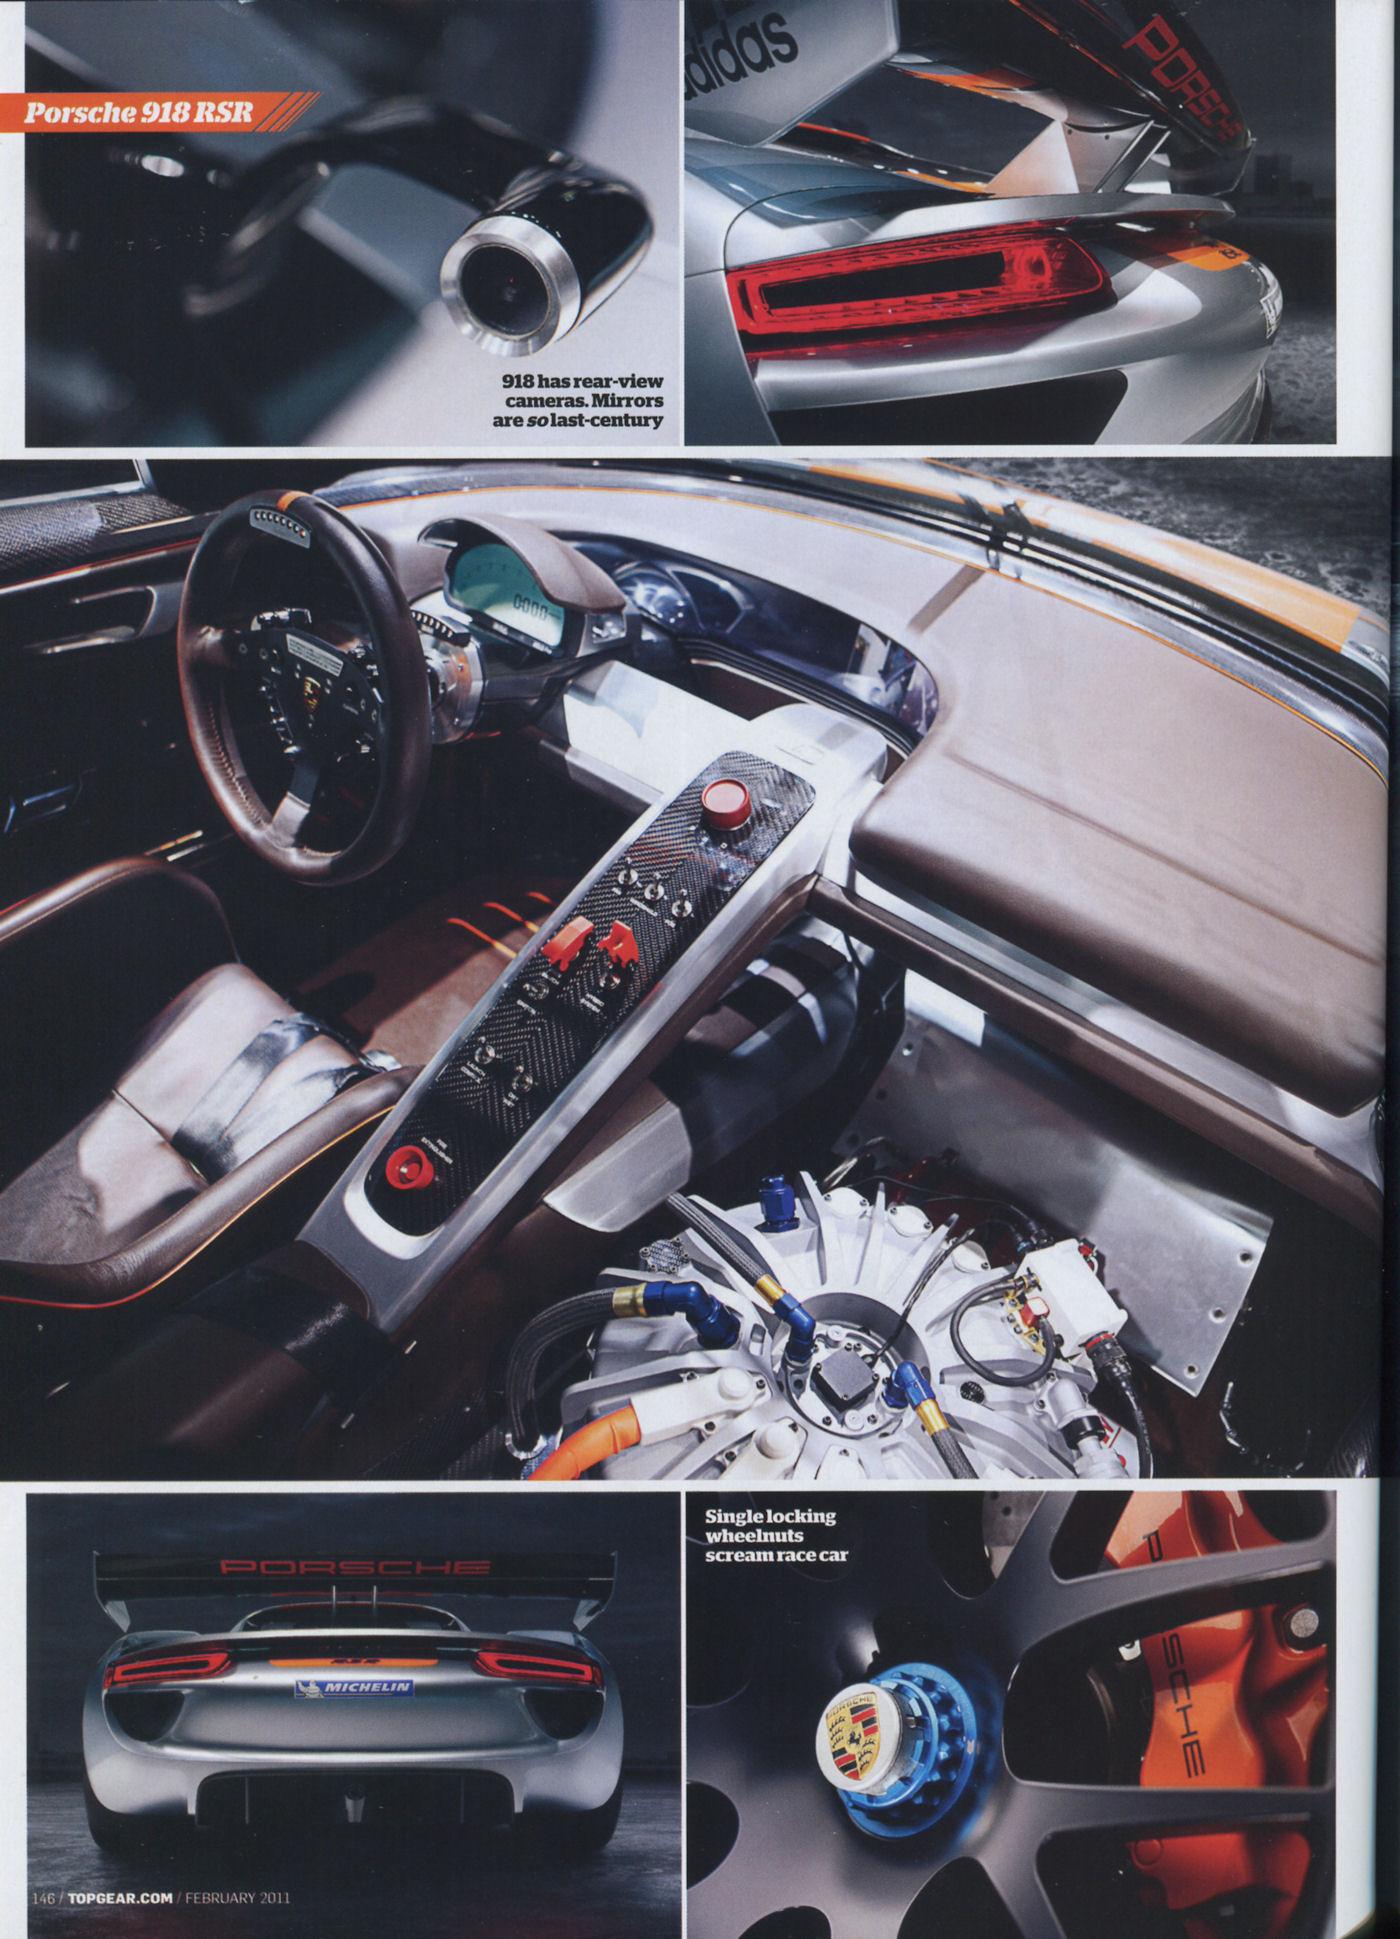 porsche 918 rsr top gear mag 02 2011 porsche cars history. Black Bedroom Furniture Sets. Home Design Ideas